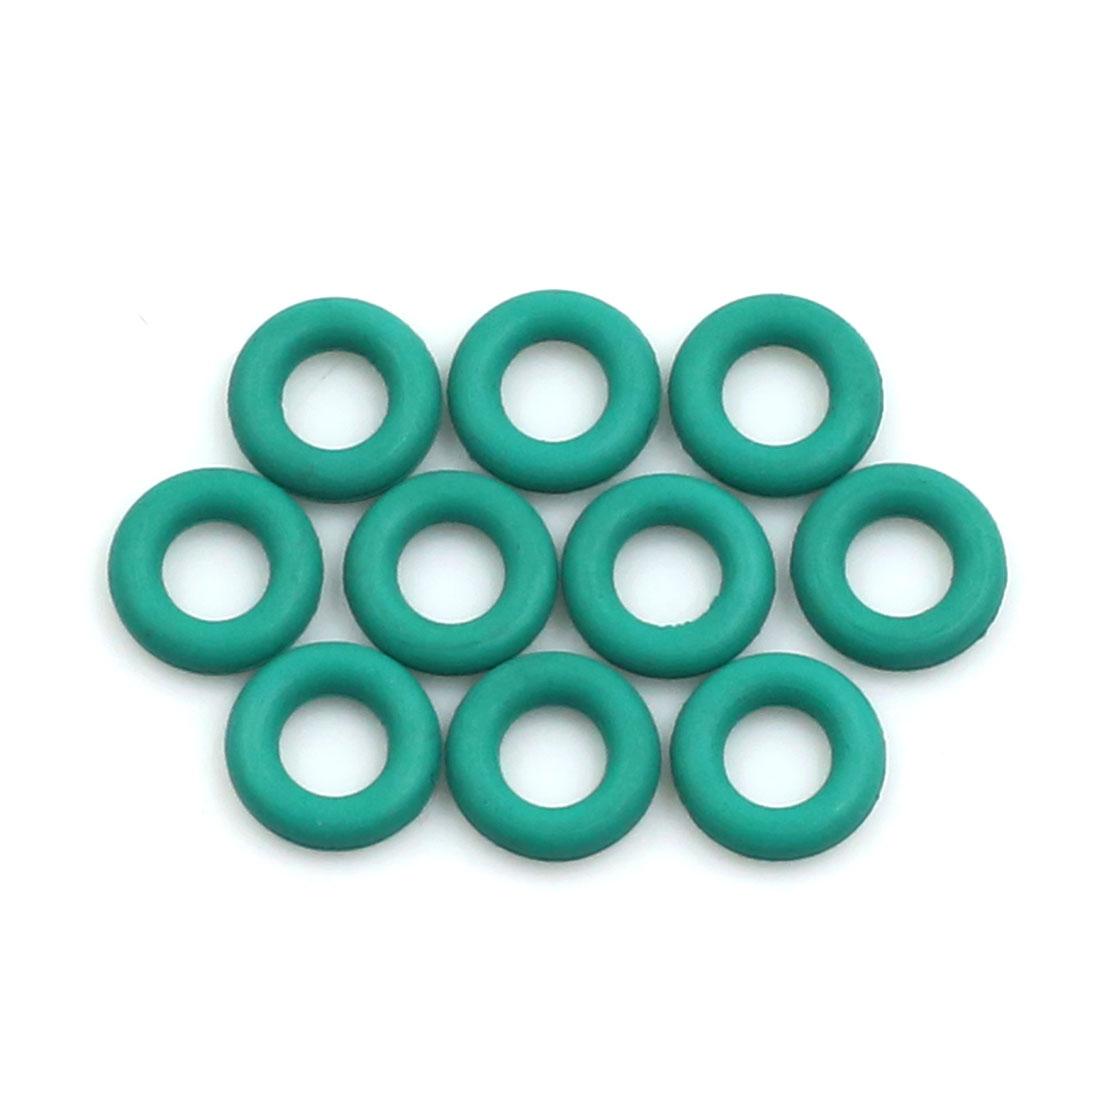 10pcs Green Universal FKM O-Ring Sealing Gasket Washer for Car 8mm x 2mm